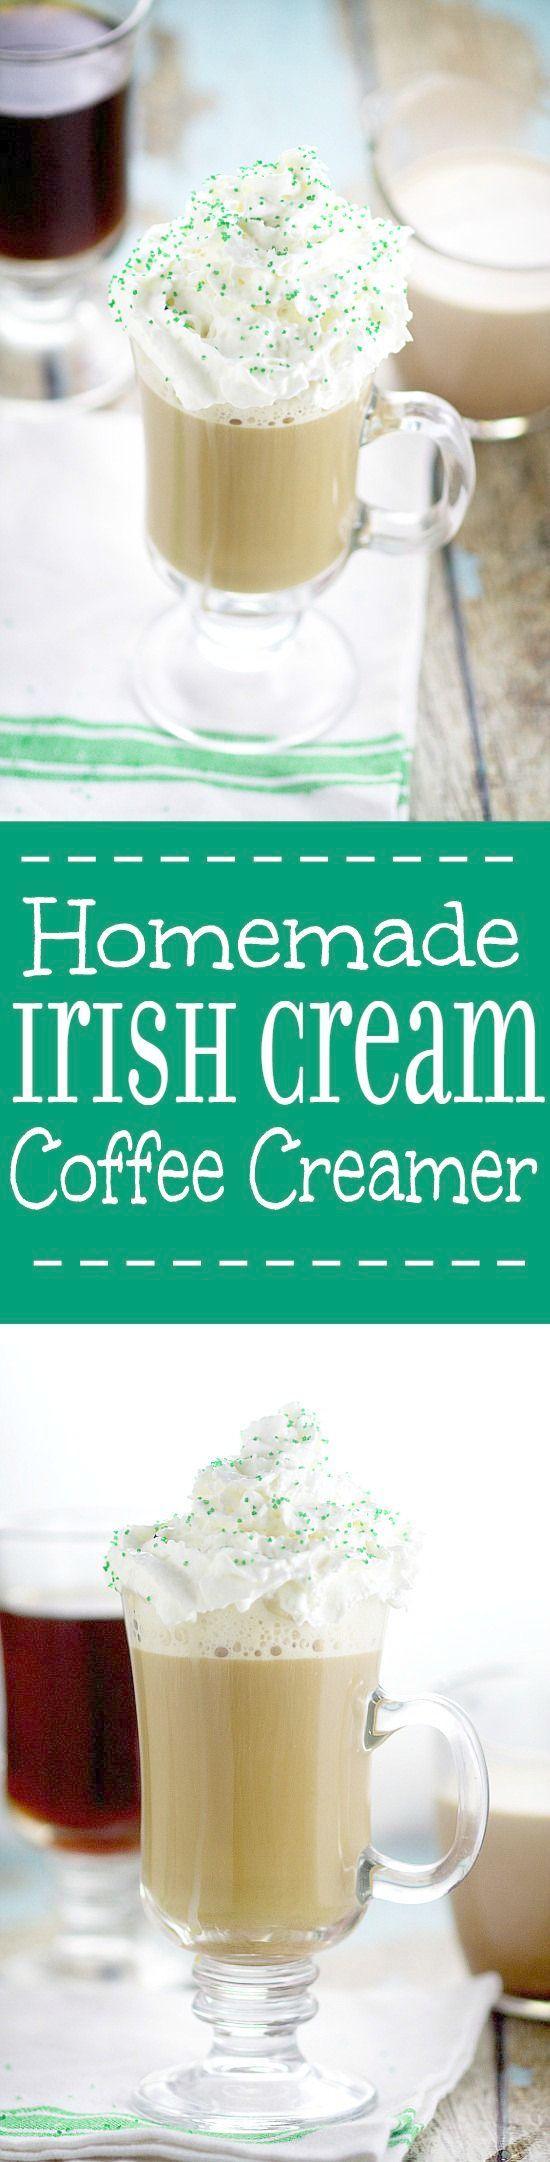 Coffee Shop Her Coffee Near Me Portland Maine Homemade Irish Cream Coffee Creamer Recipe Creamer Recipe